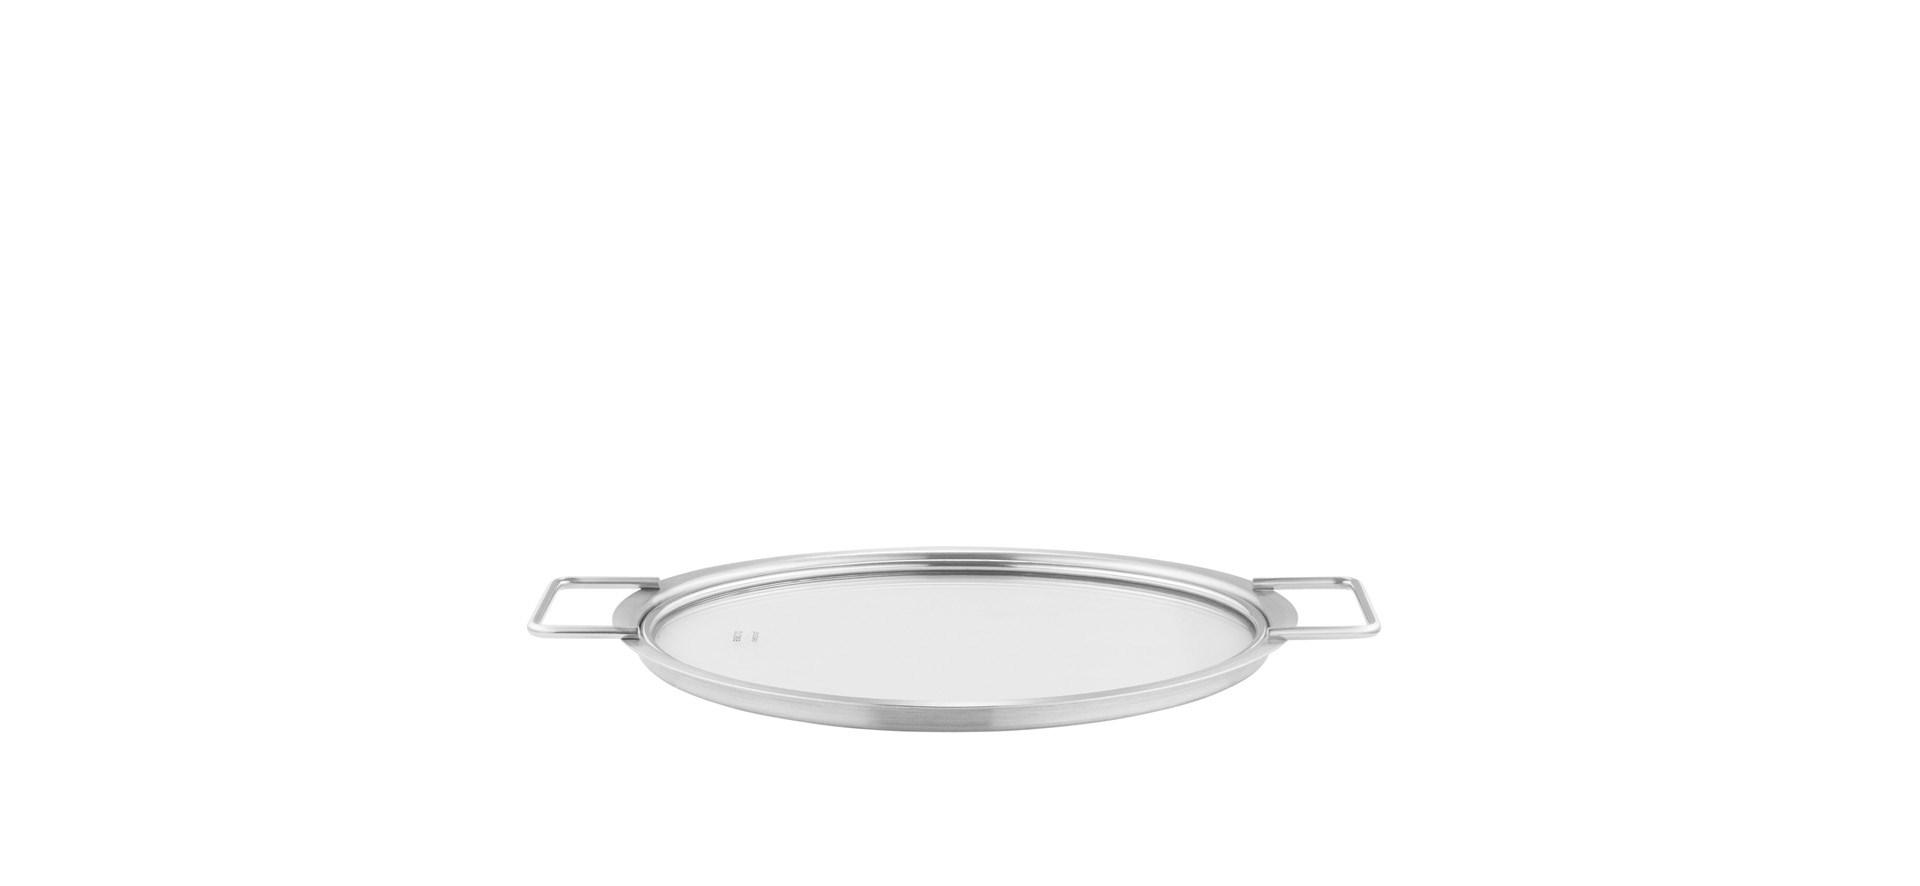 Eva Trio - Stainless Steel/Glass Lid - 24 cm (201024)